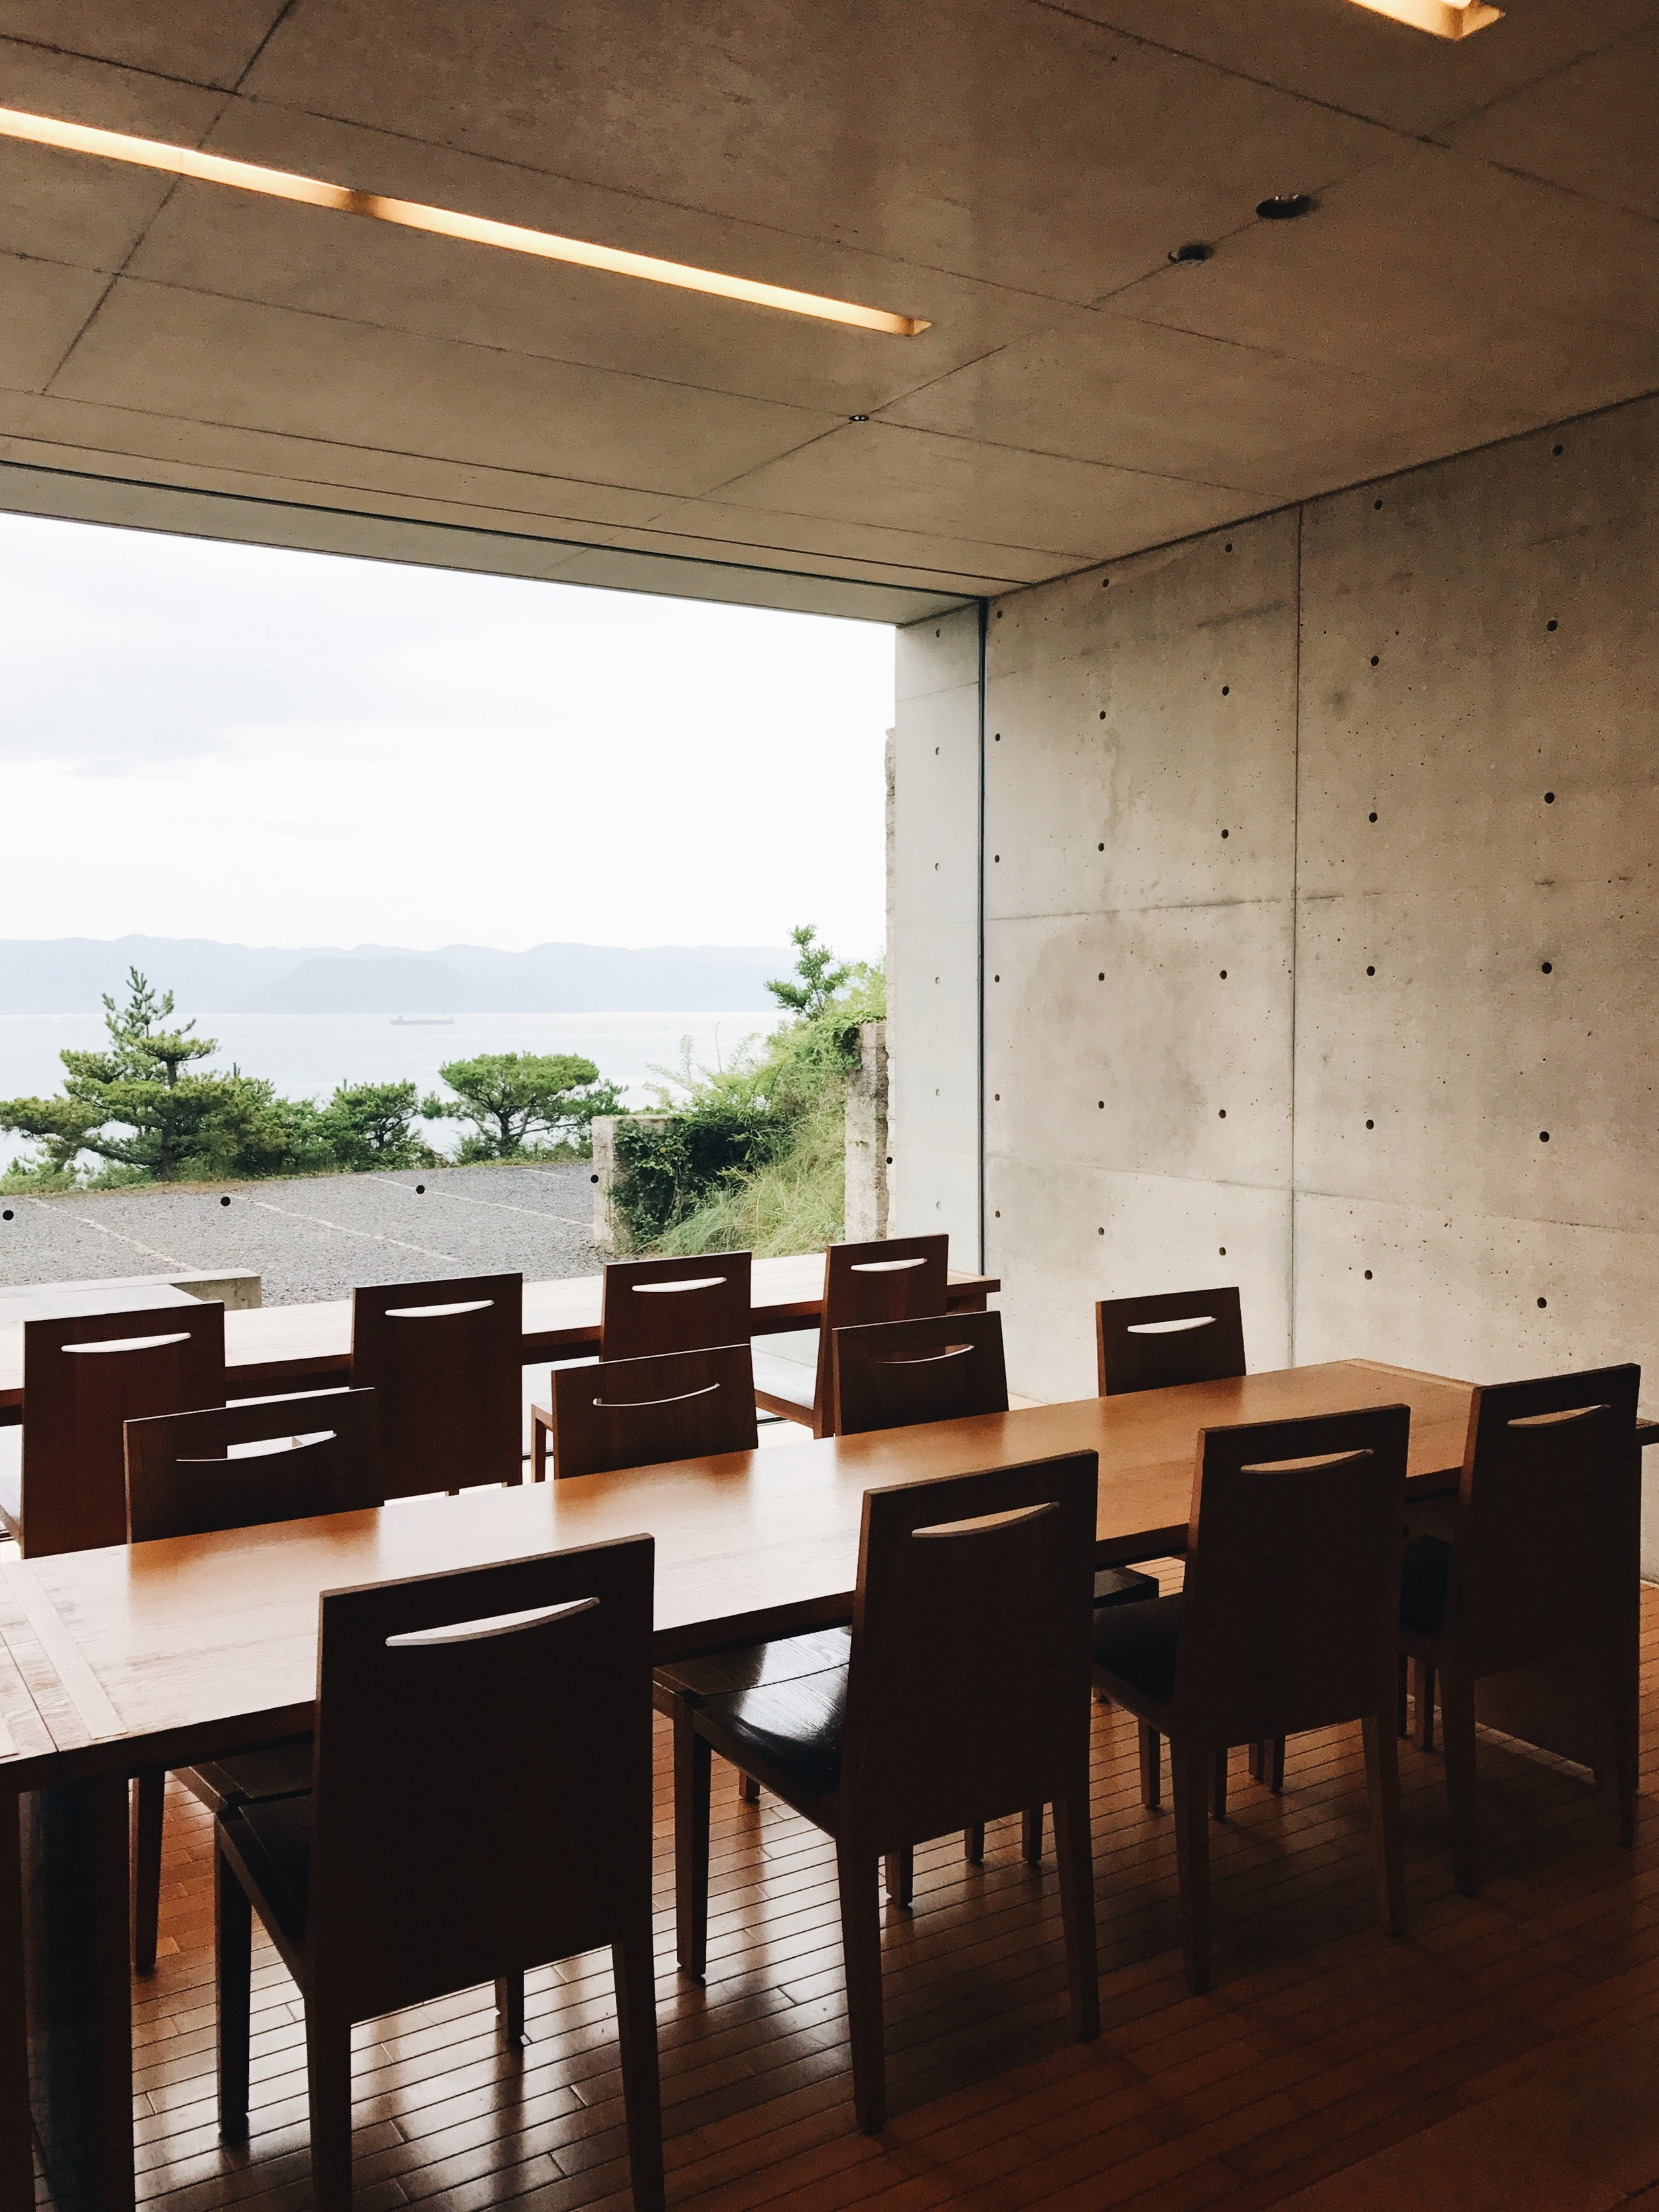 The beautiful Chichu Museum cafe!